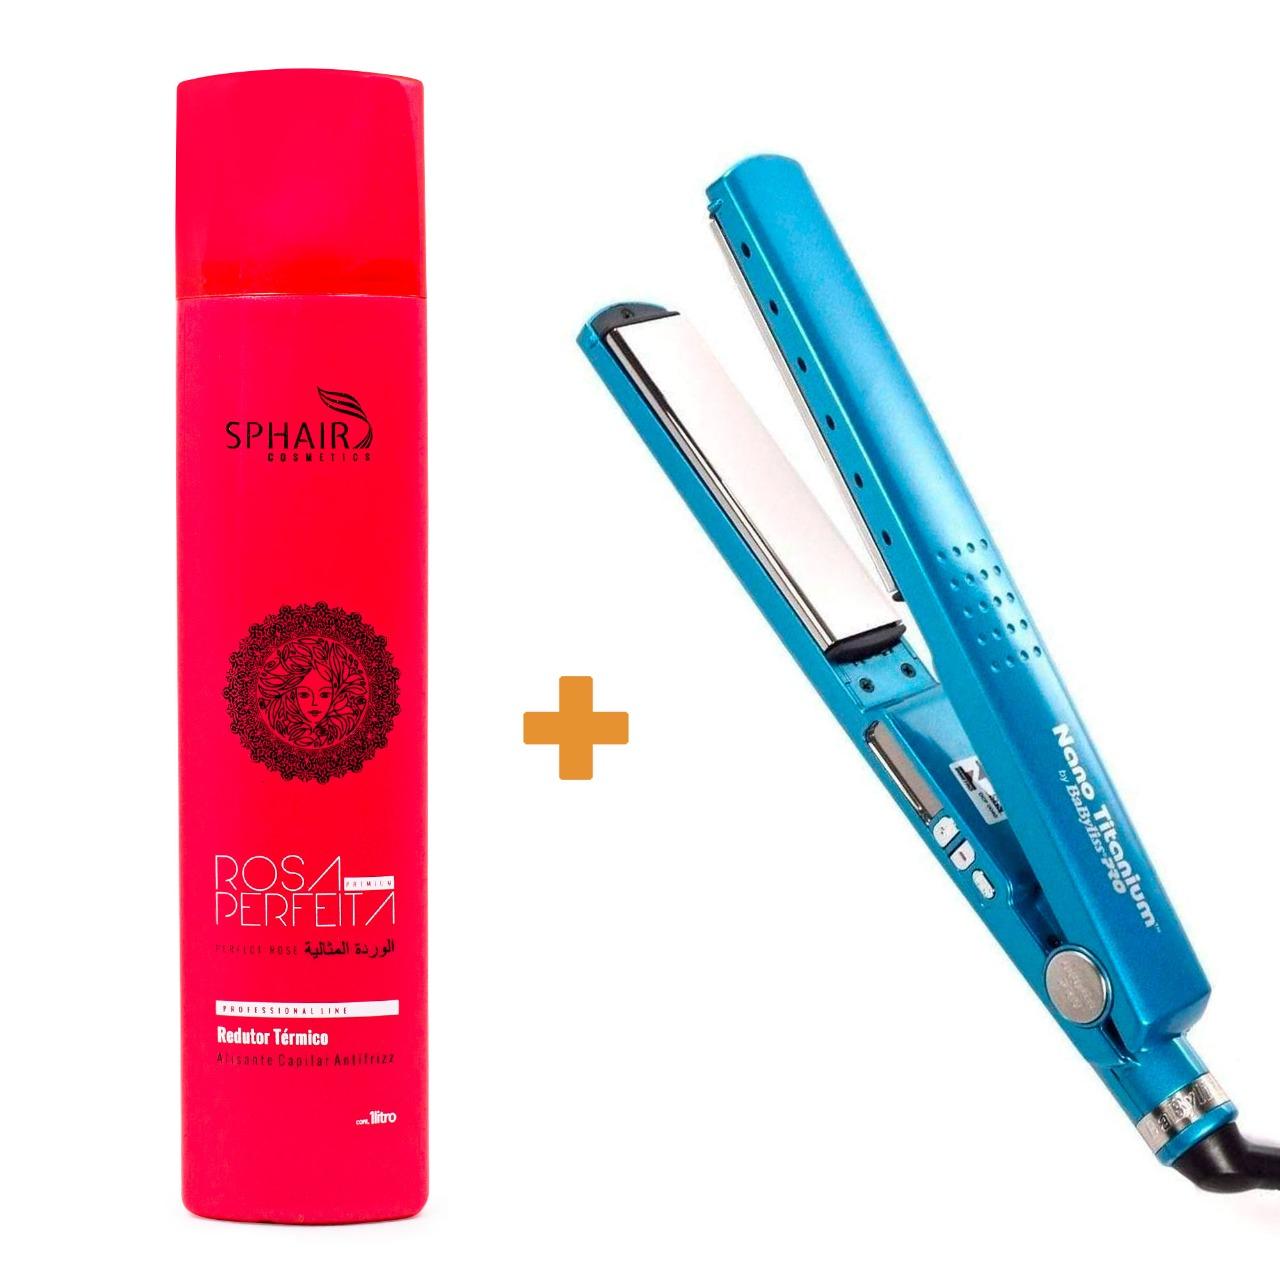 Progressiva Rosa Perfeita + Prancha BabyLiss Nano Titanium de R$772,10 por 690,47